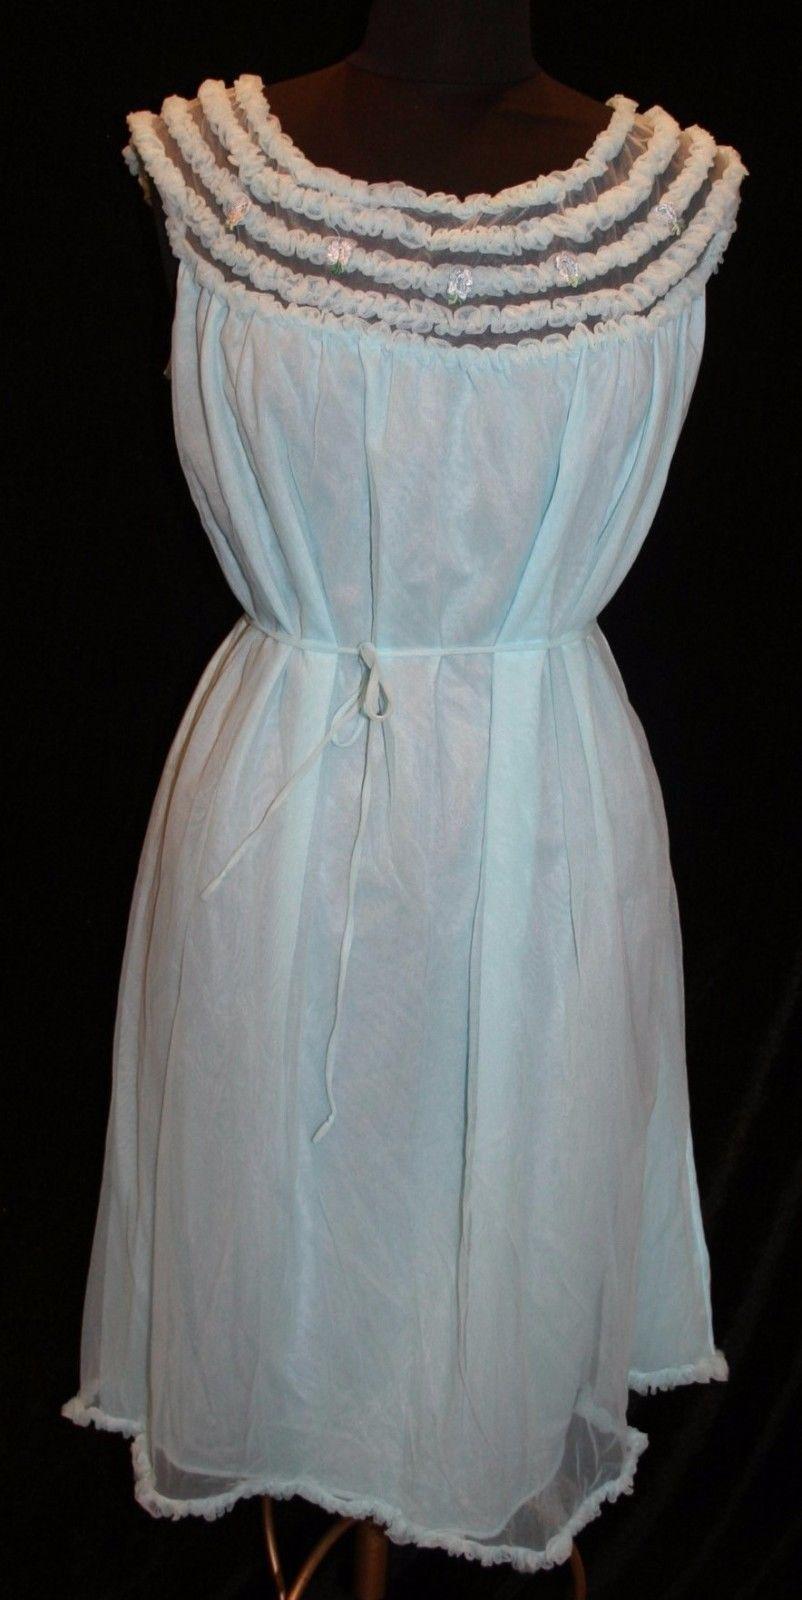 4efabea9d Adonna Sz M Vtg Nightie Nightgown Lingerie and 23 similar items